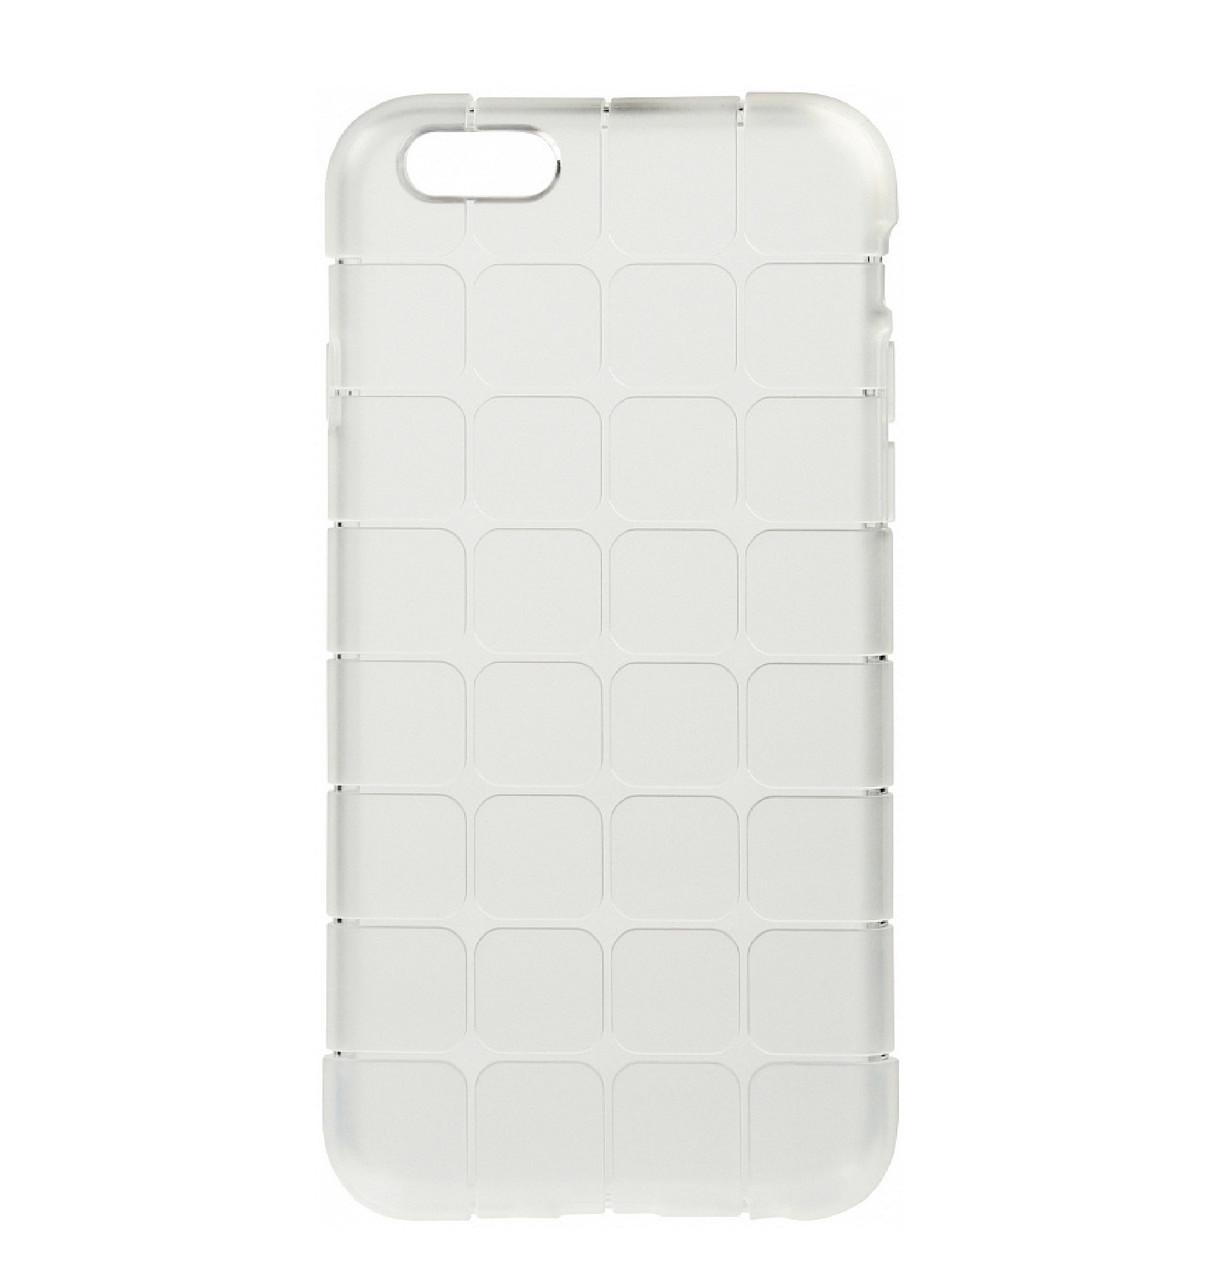 Силиконовый чехол (накладка) TOTO TPU case Square для IPhone 6 / 6s White